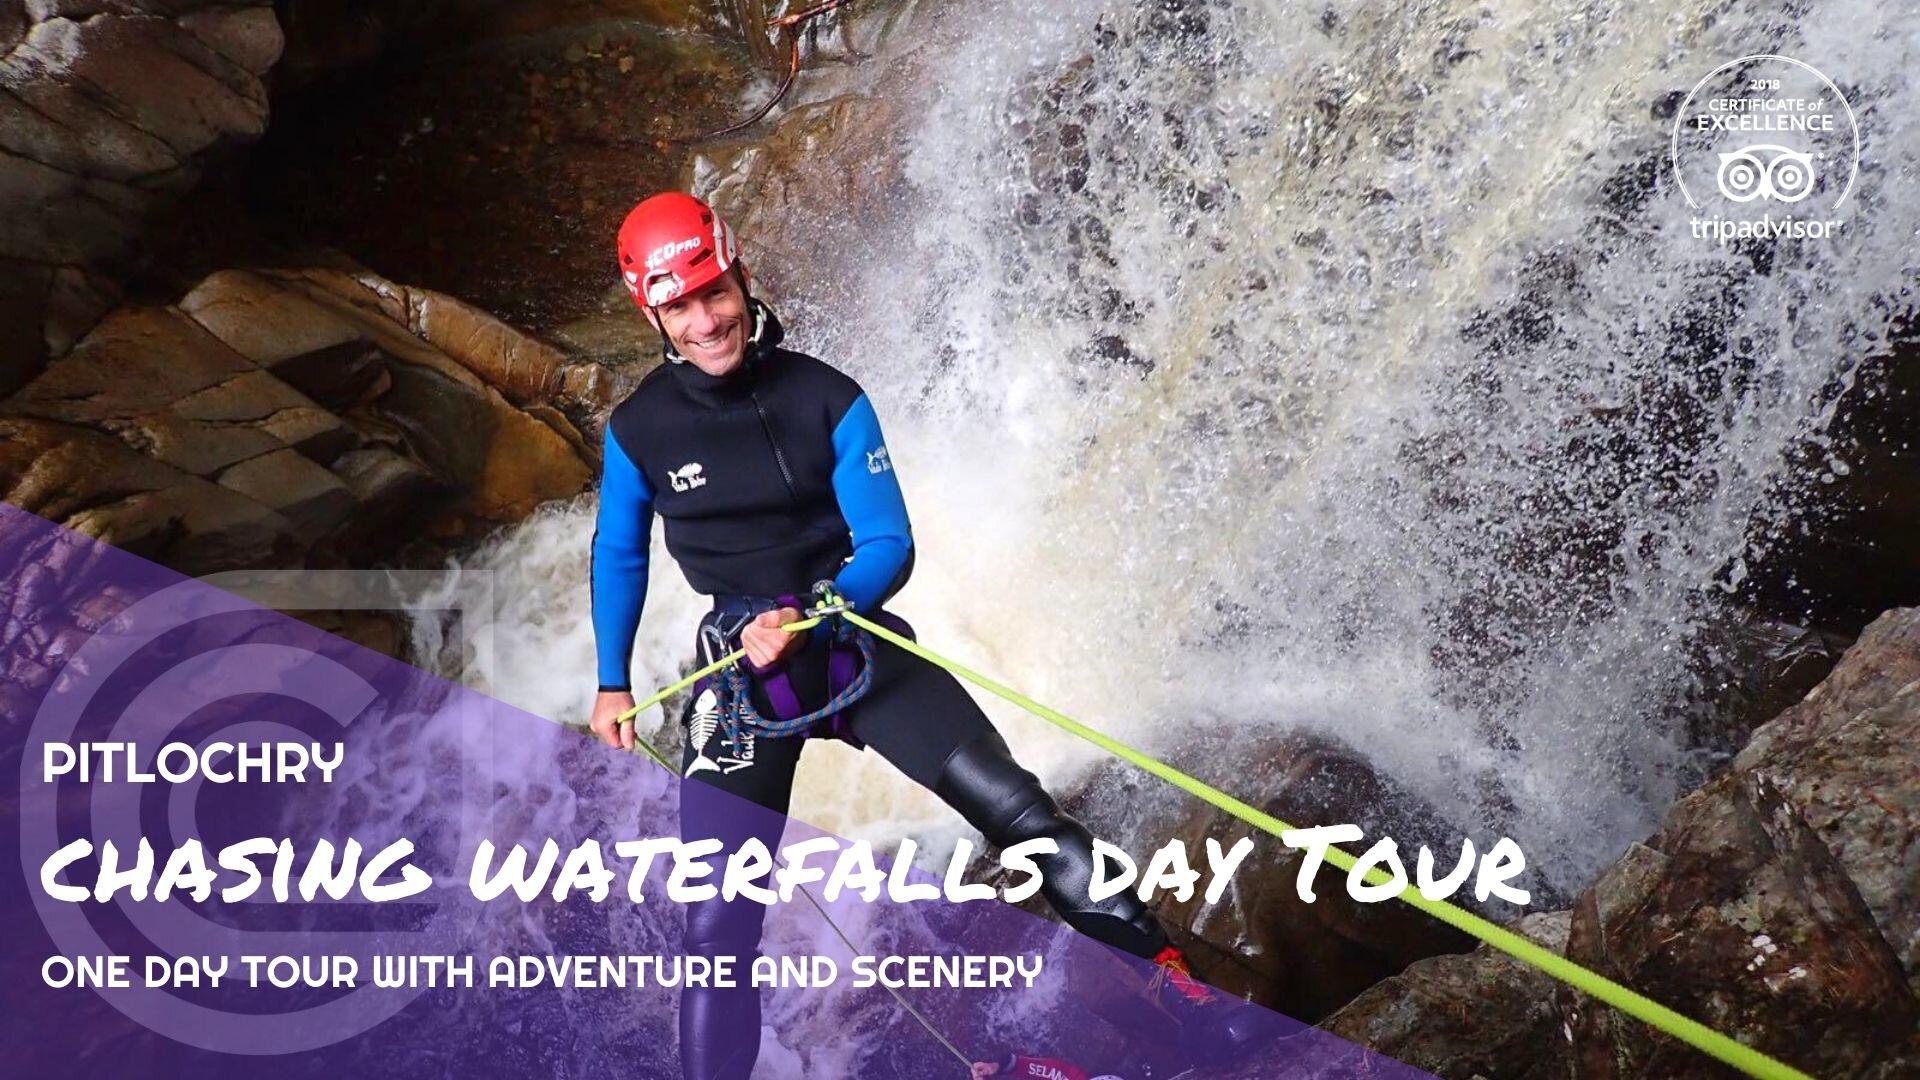 Chasing Waterfalls - Perthshire Day tour